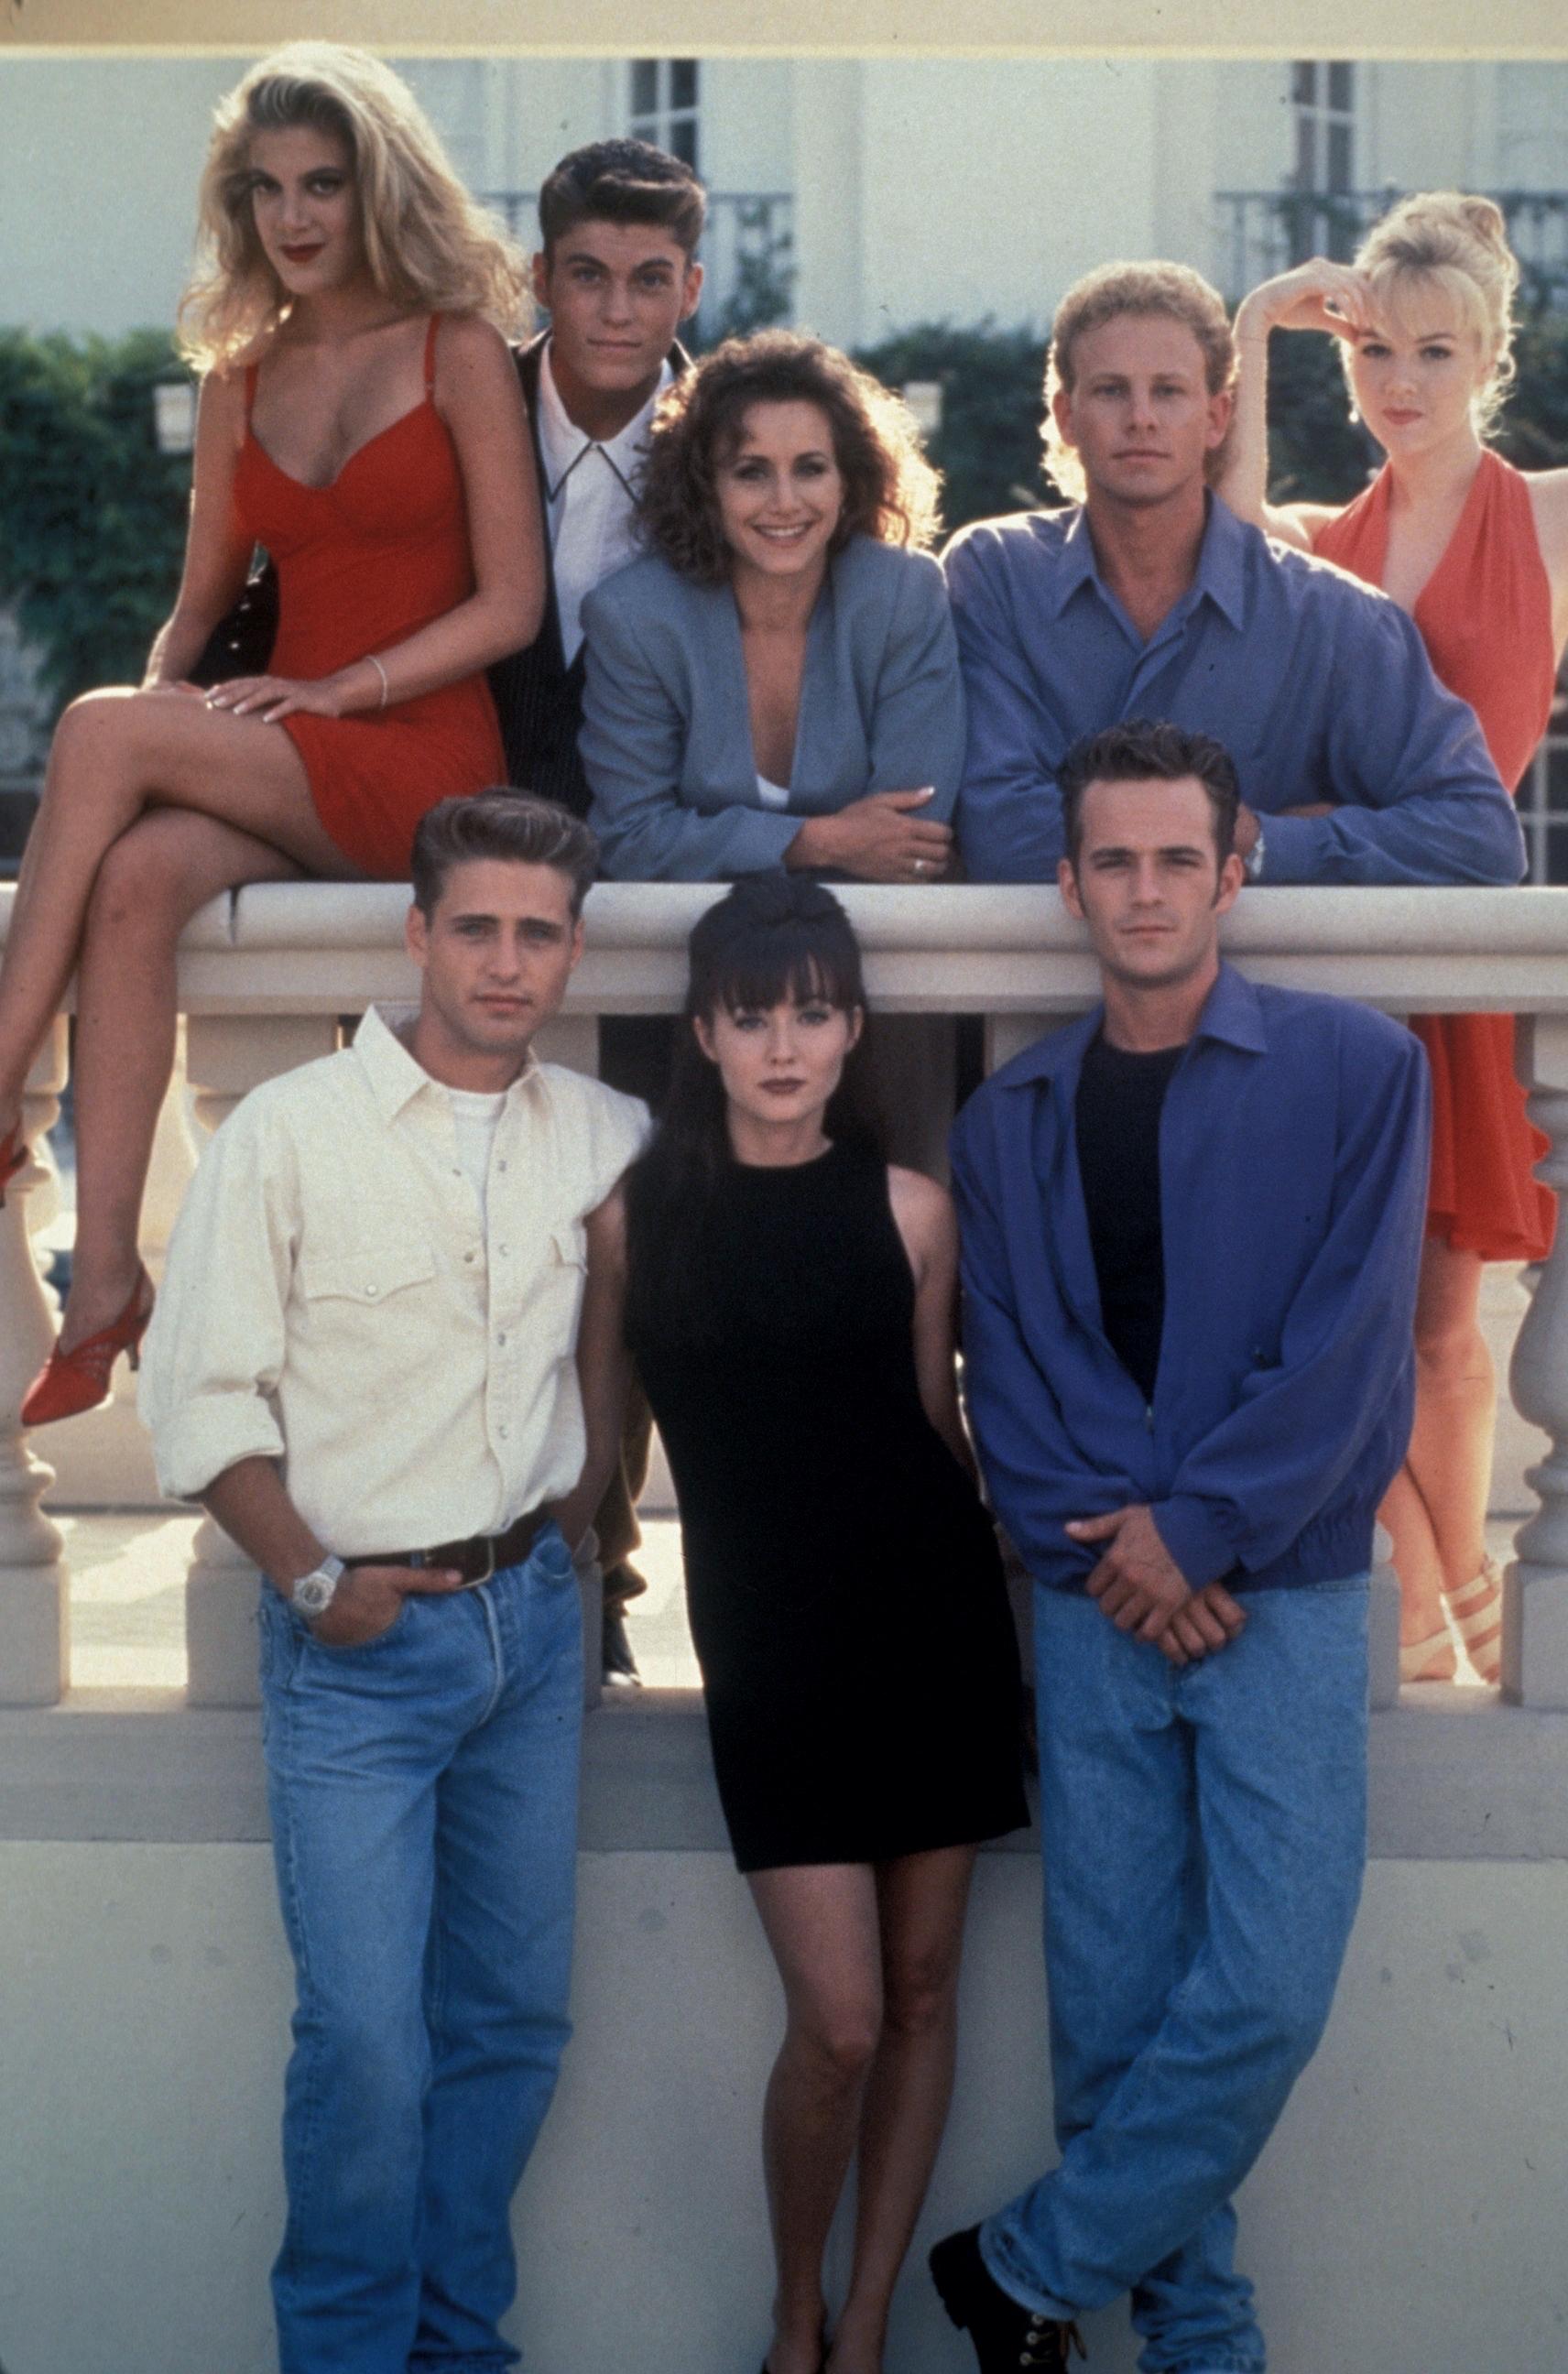 Beverly hills cast 90210 90210 (TV